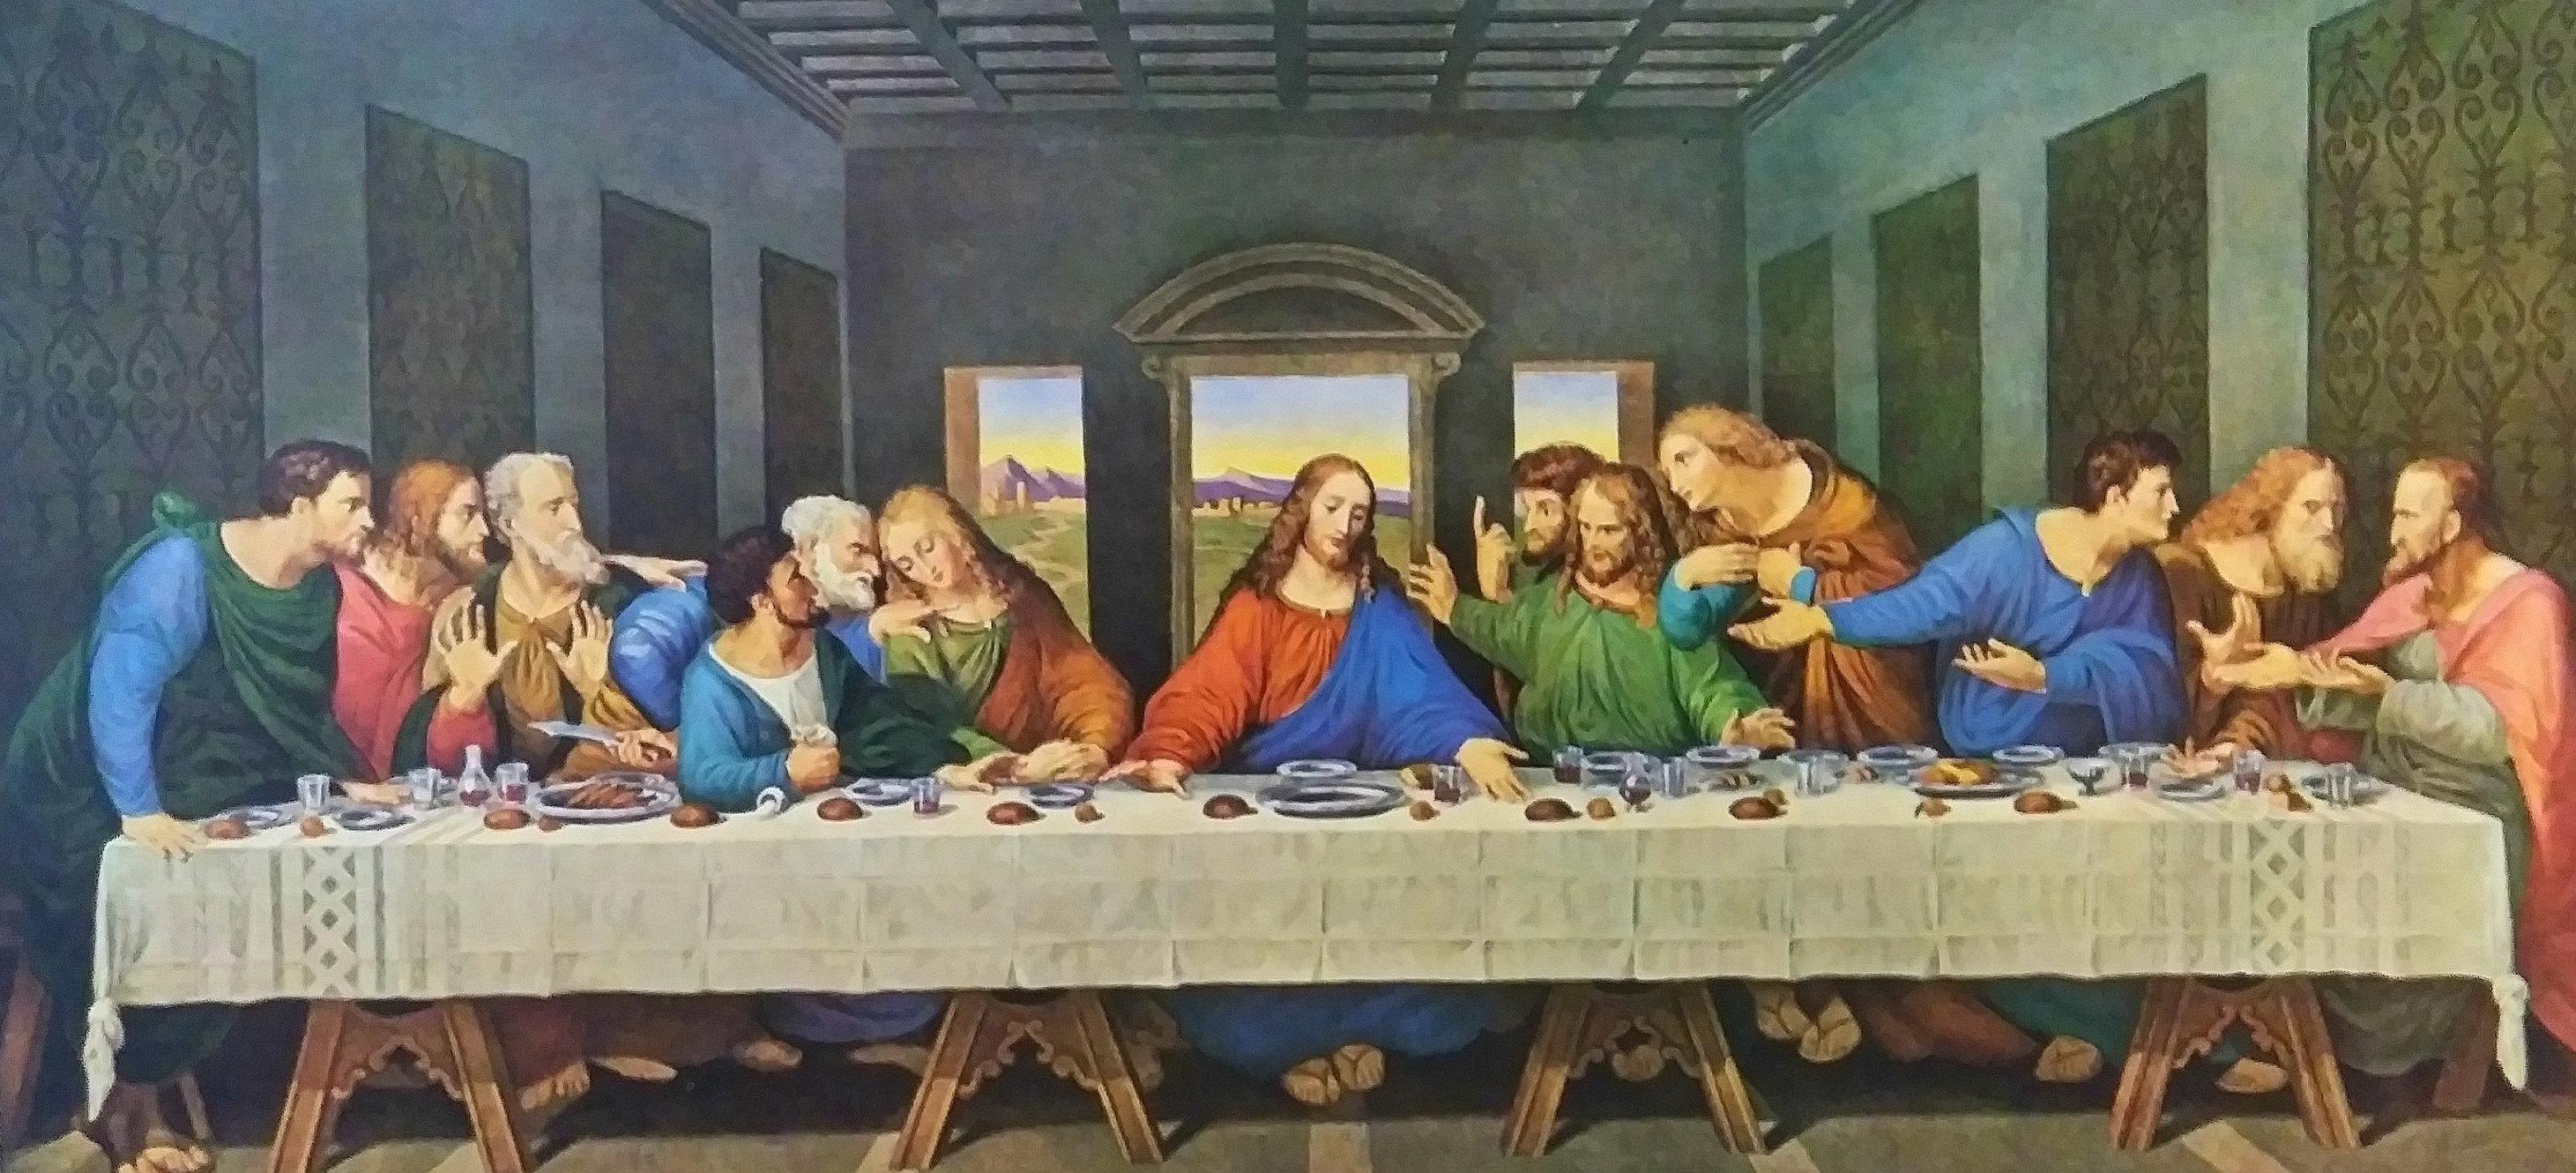 Leonardo Da Vinci The Last Supper Coloring Page The Last Supper Fresco Leonardo Da Vinci Fine Art Print Jesus And Disciples Religious Art Christian Art